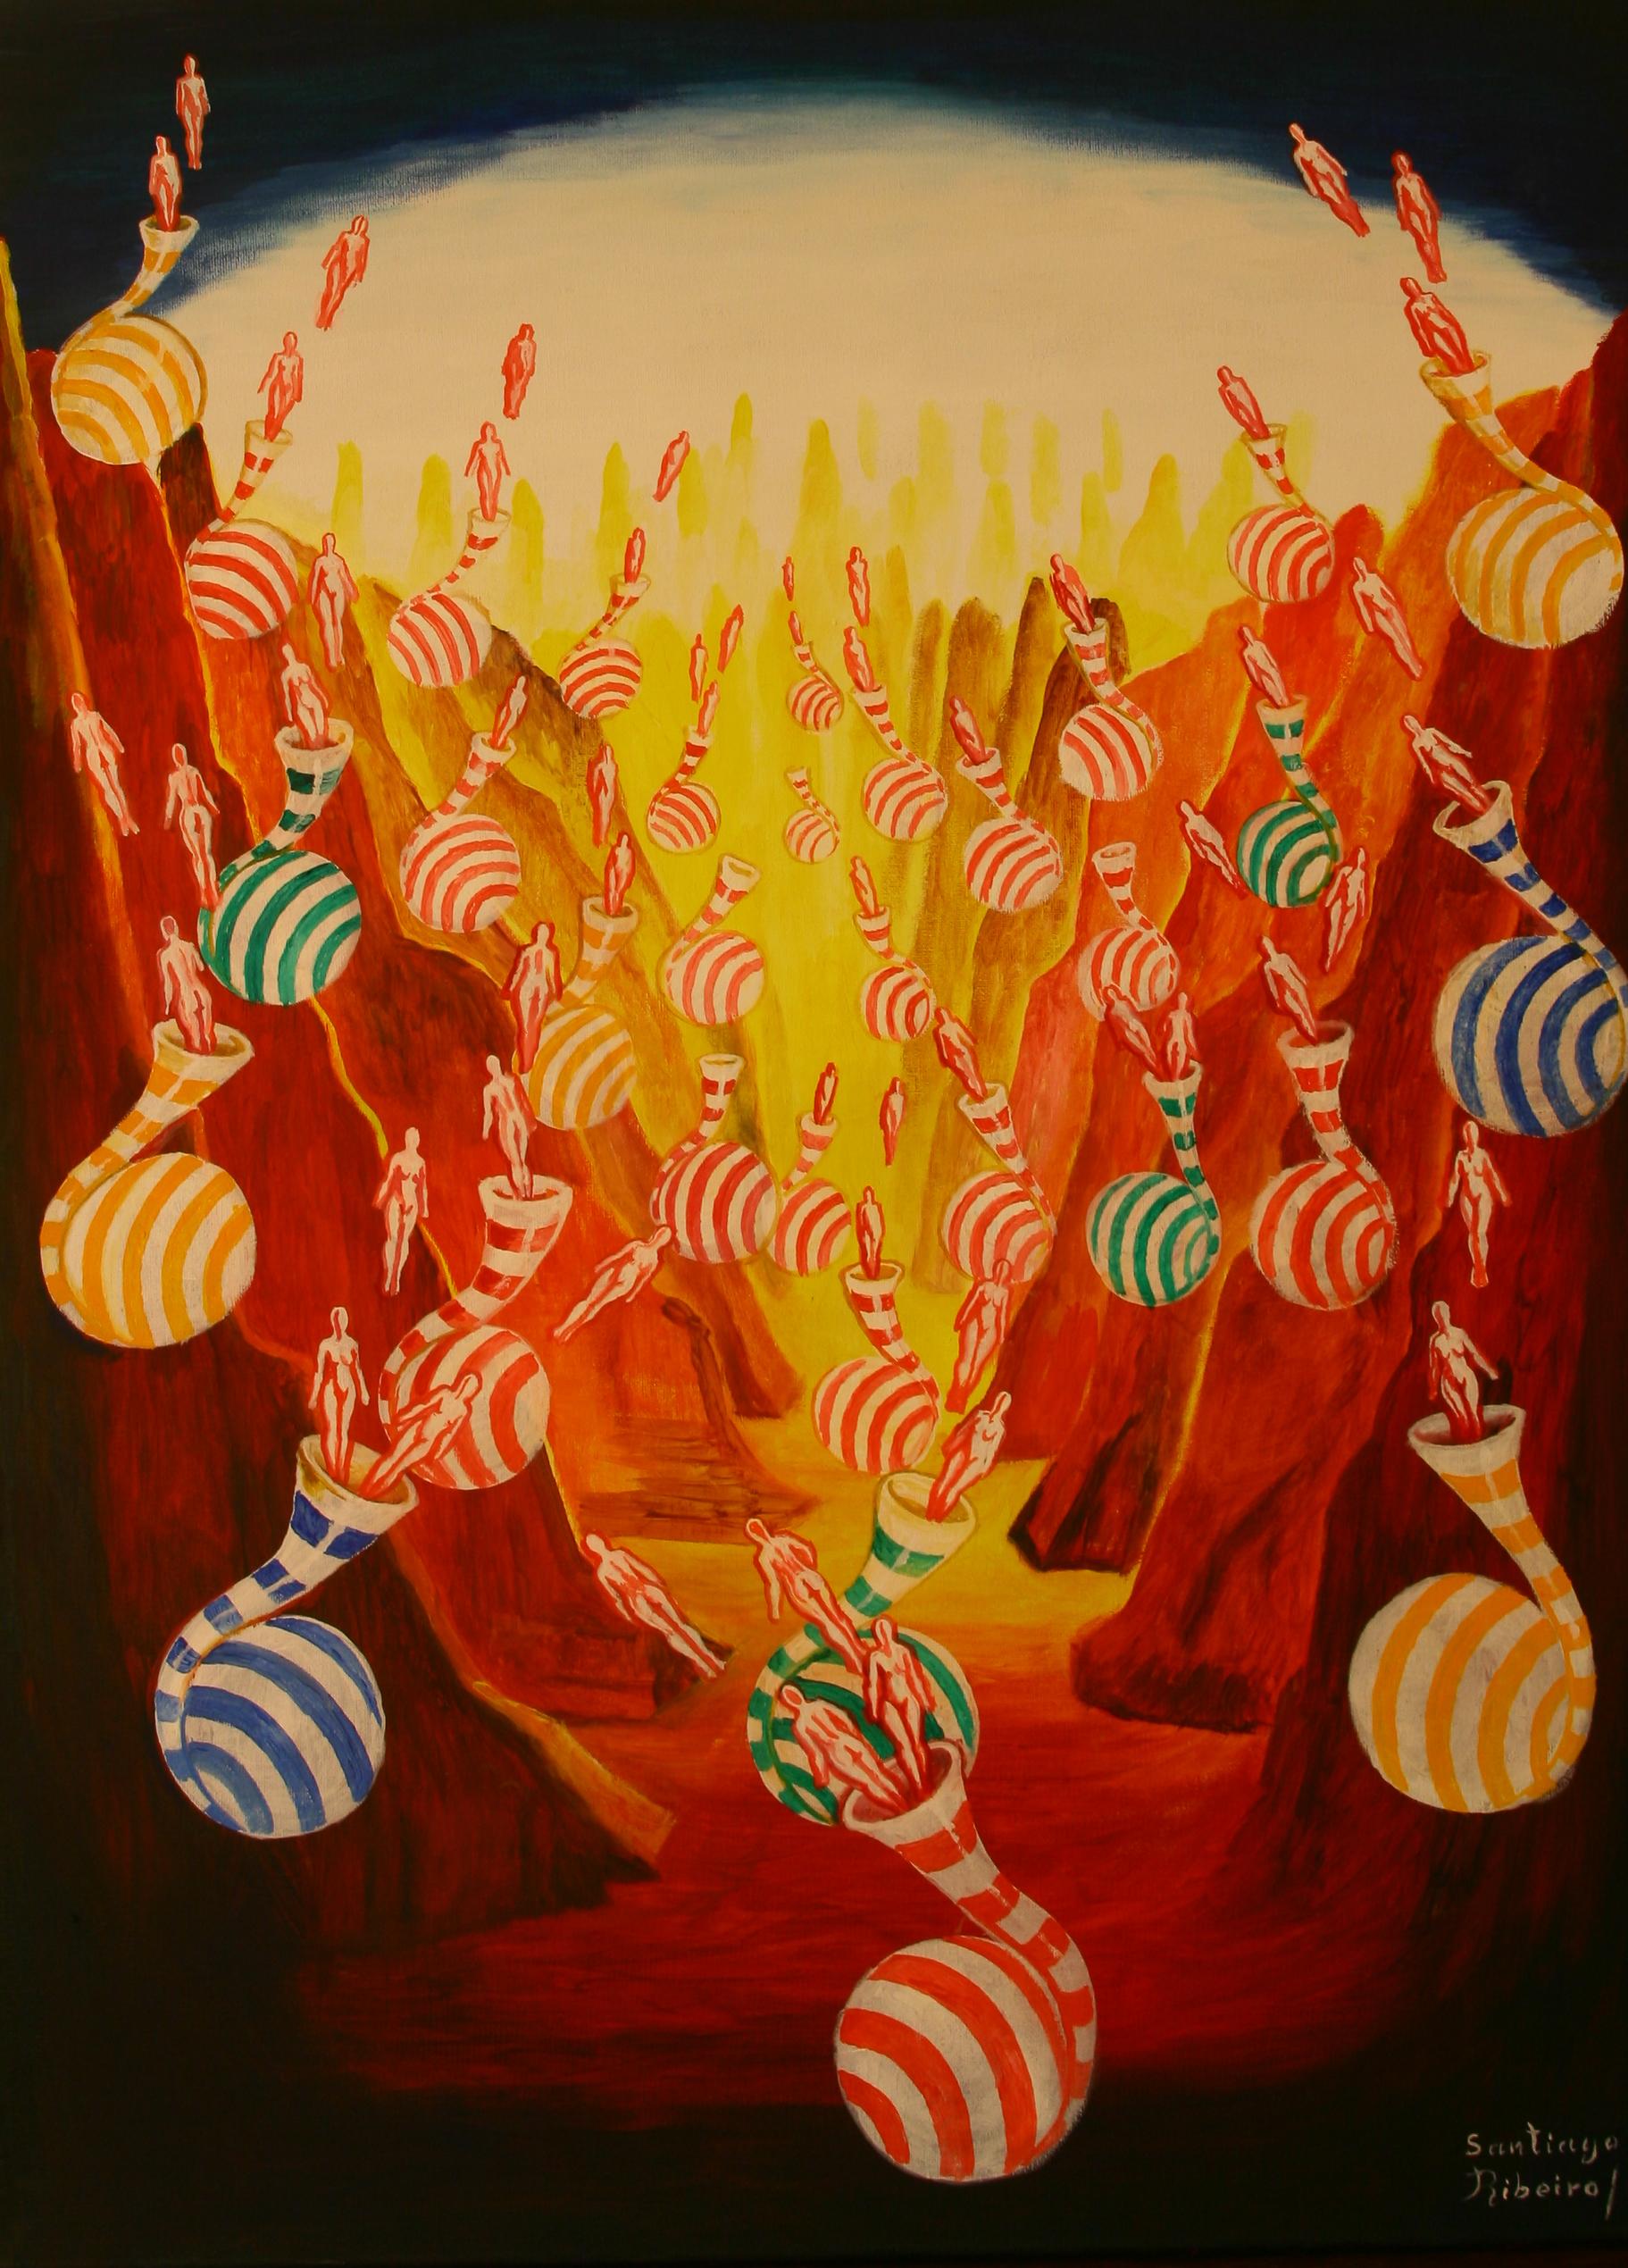 Santiago Ribeiro painting Fluídos